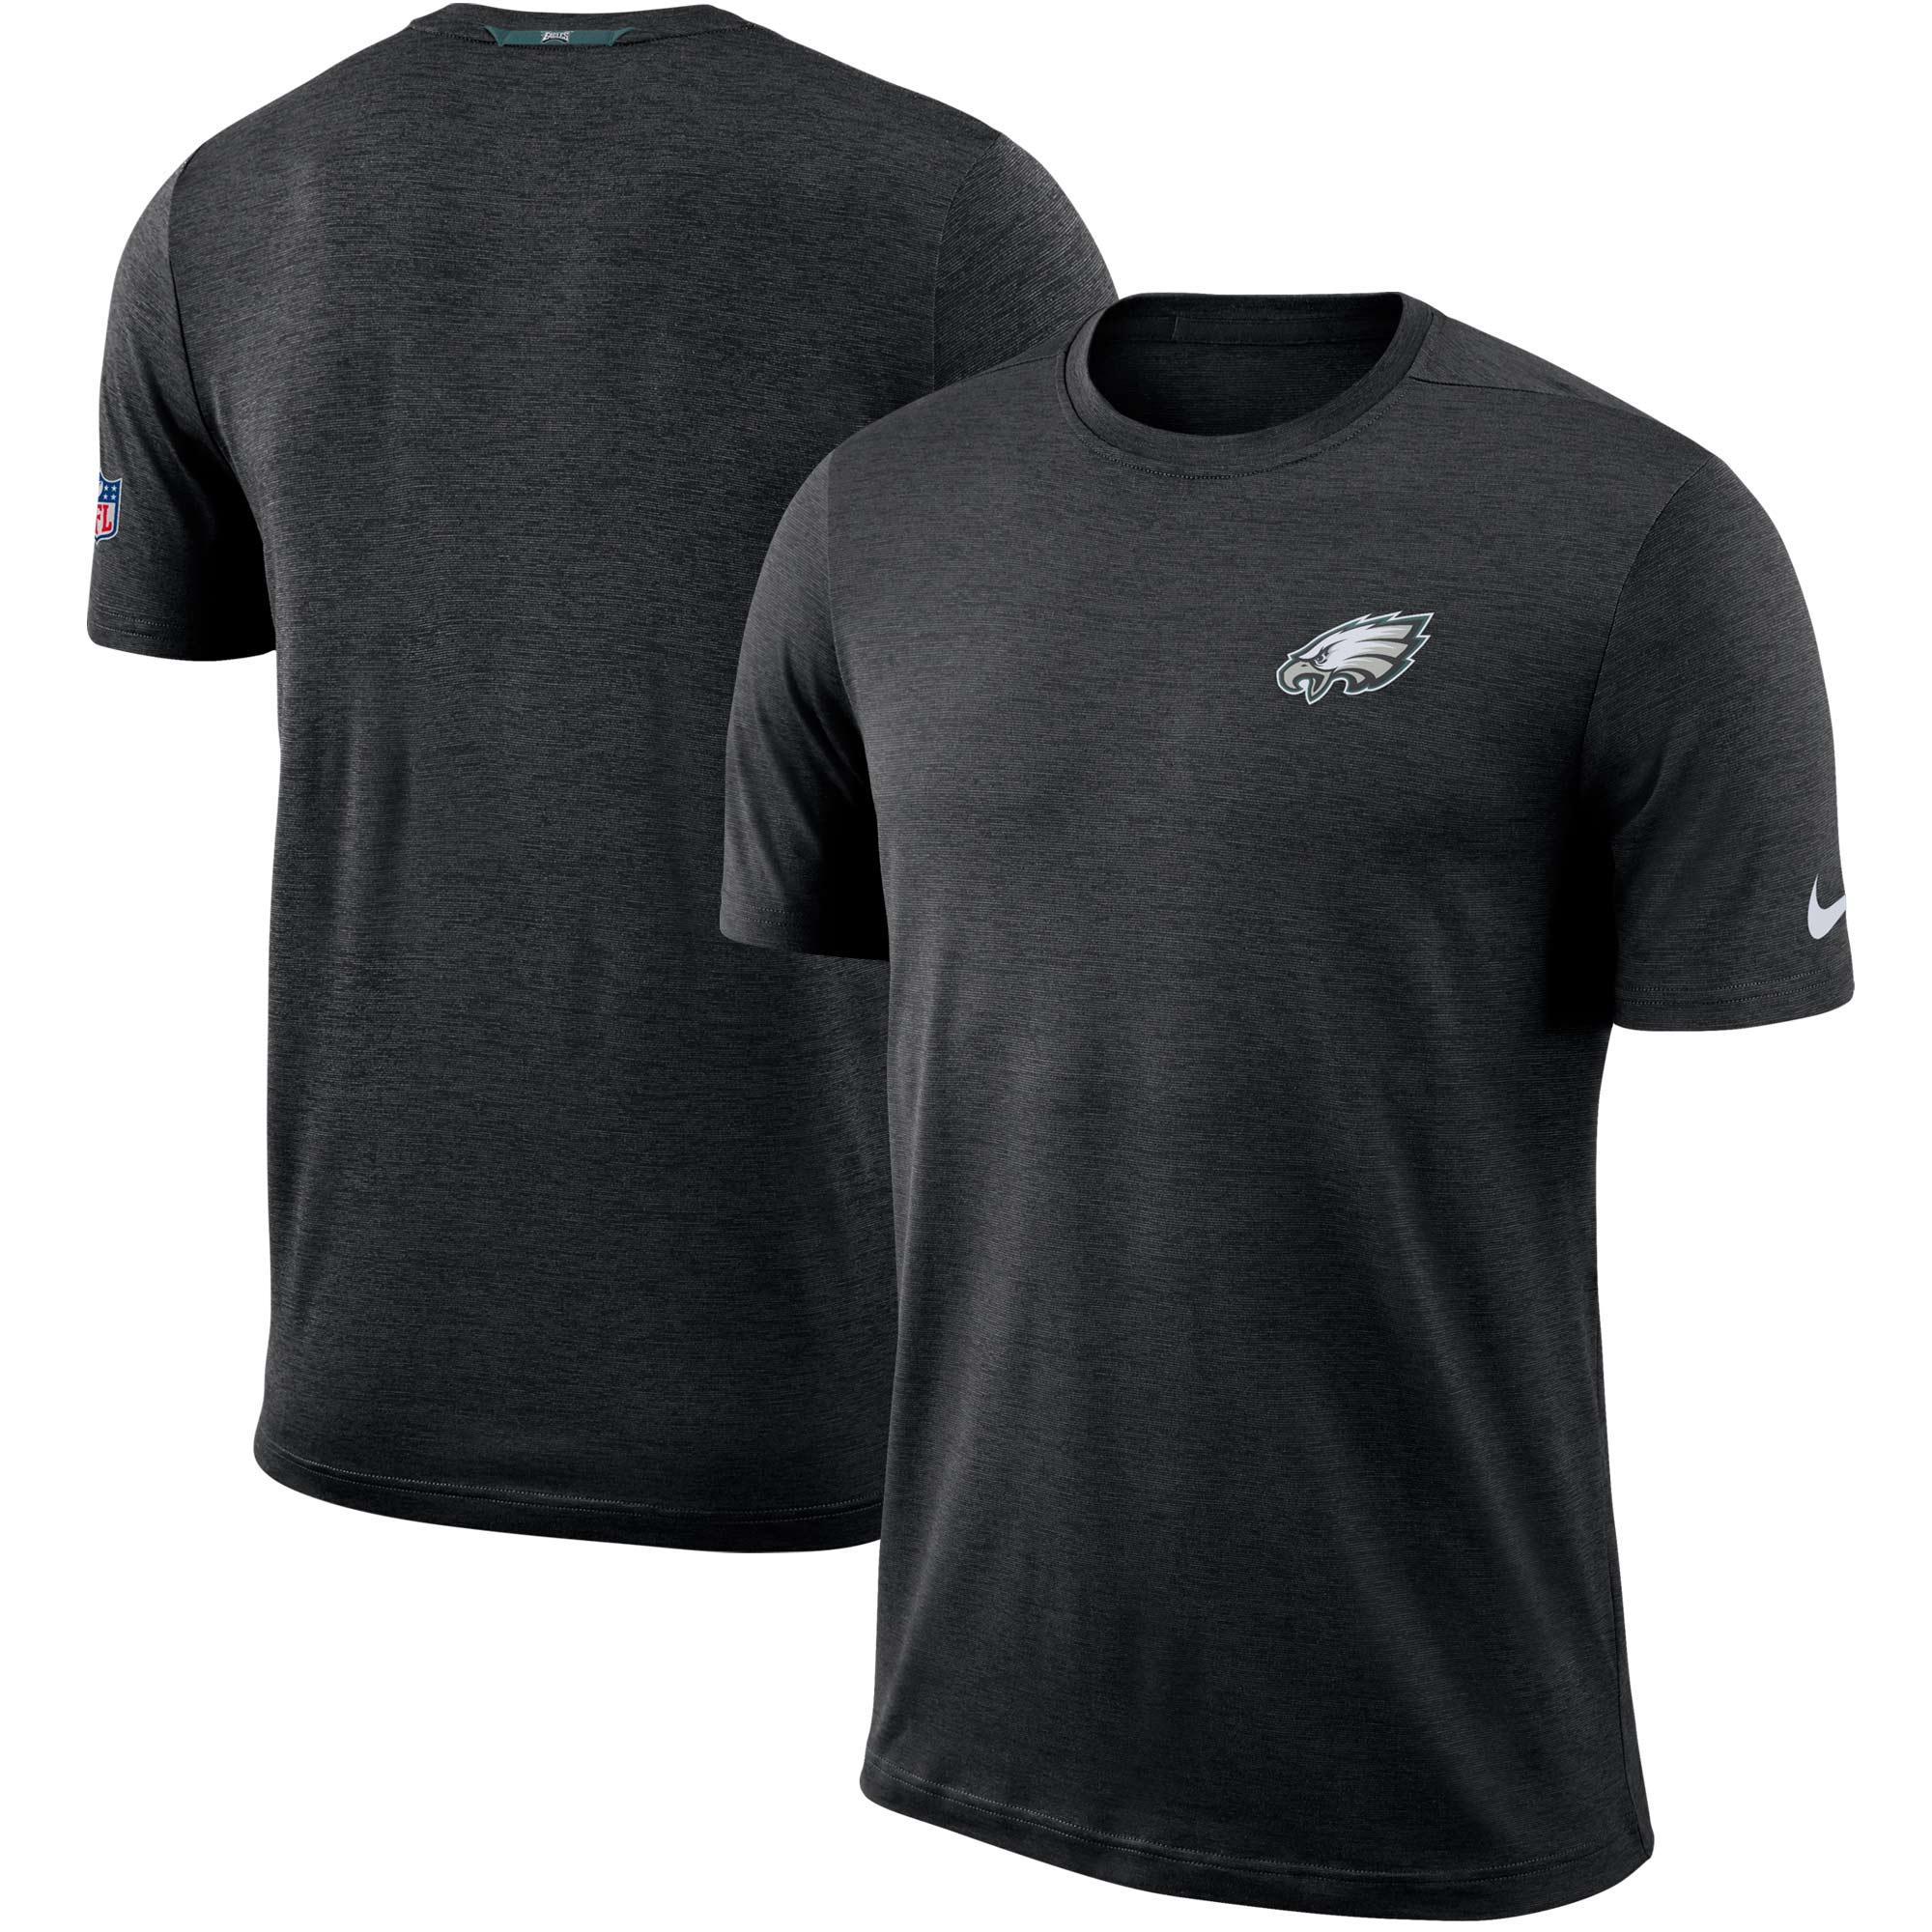 Philadelphia Eagles Nike Sideline Coaches Logo Performance T-Shirt - Black - S